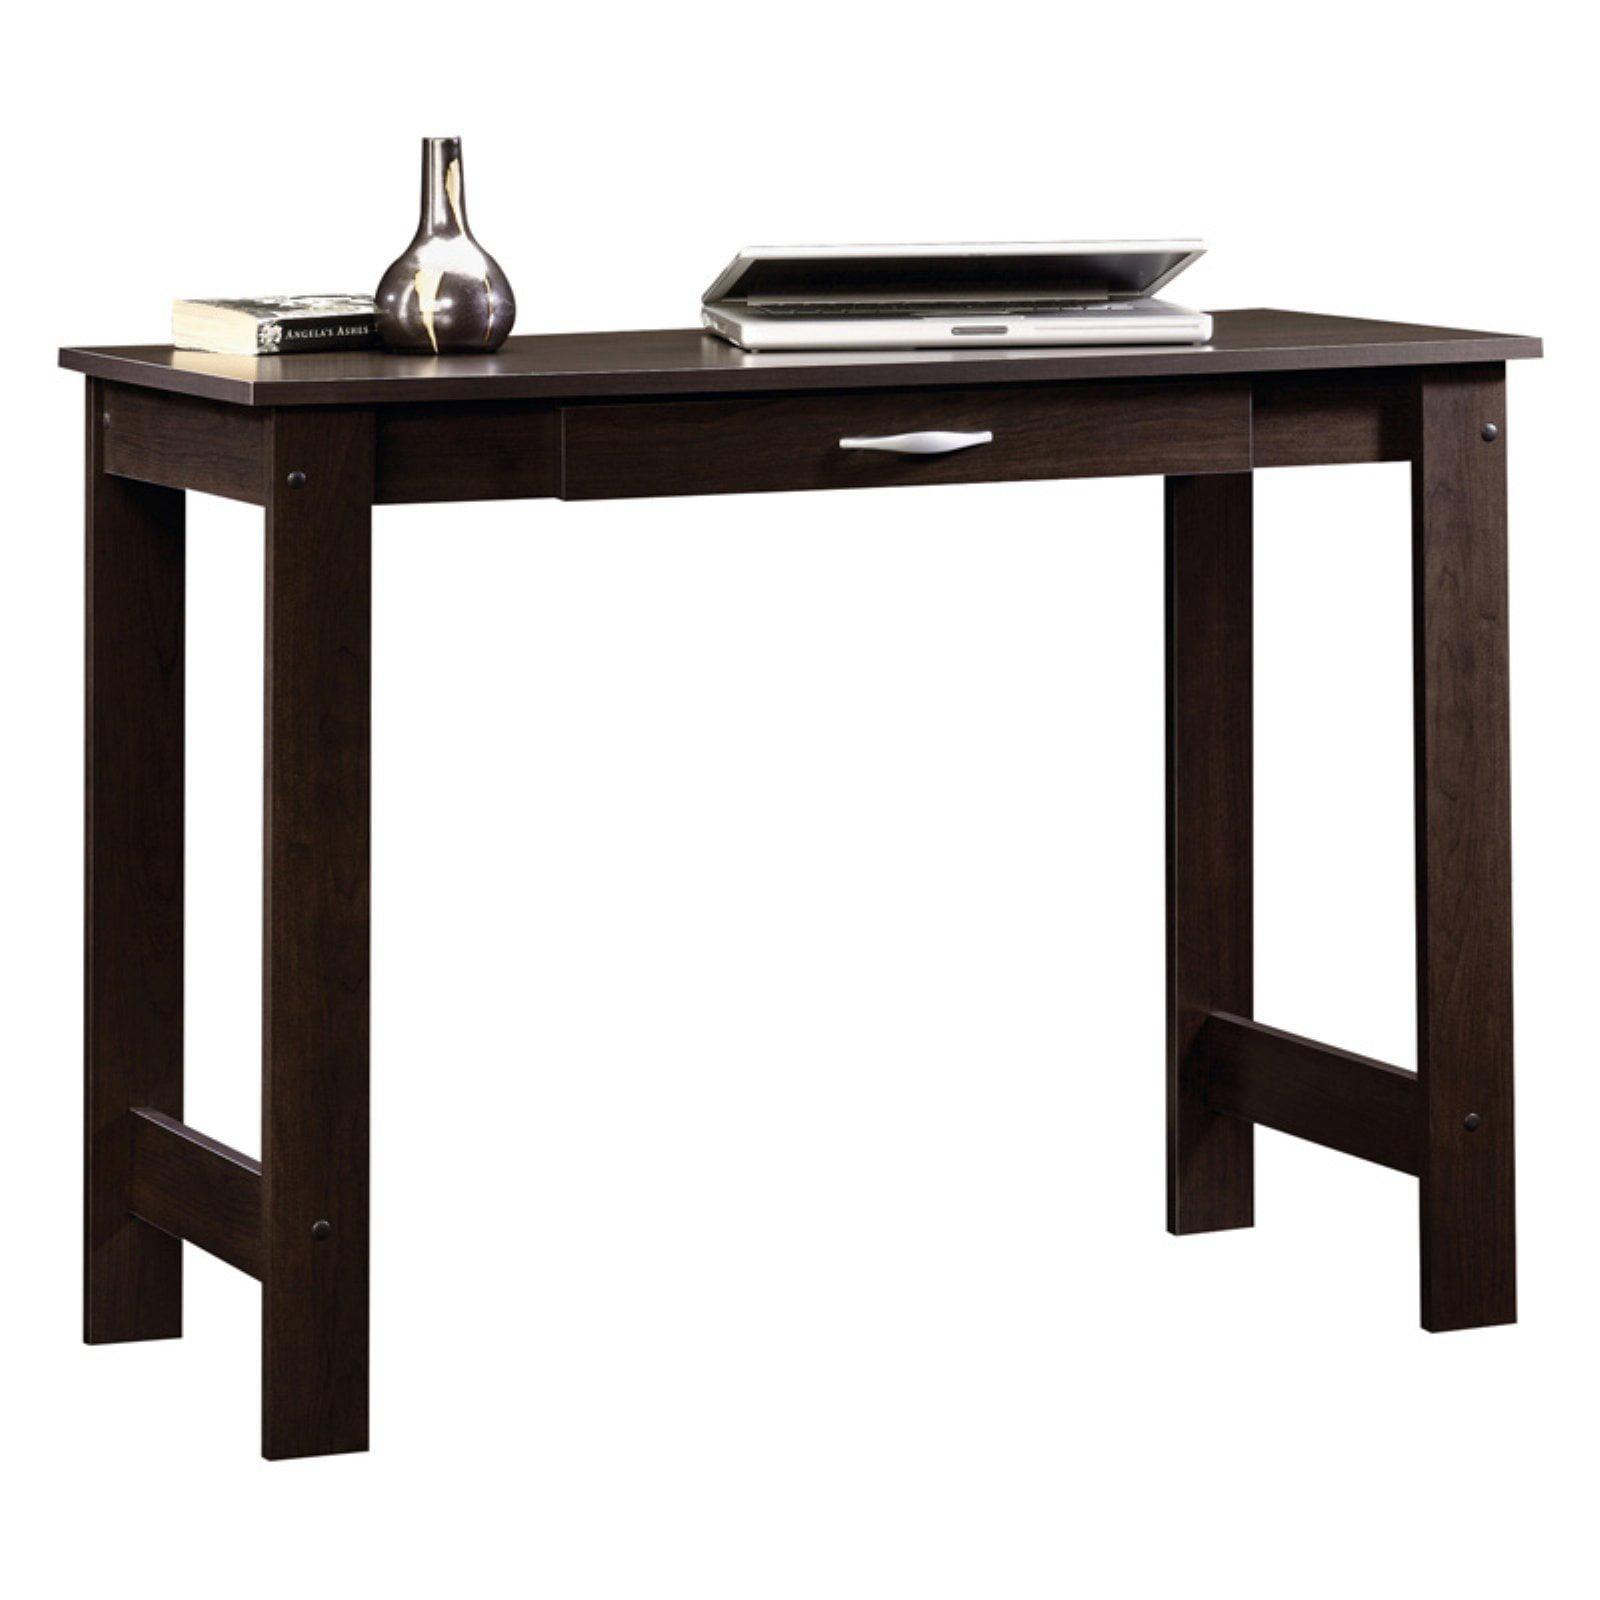 Sauder Beginnings Writing Table - Cinnamon Cherry - 39.2 in.